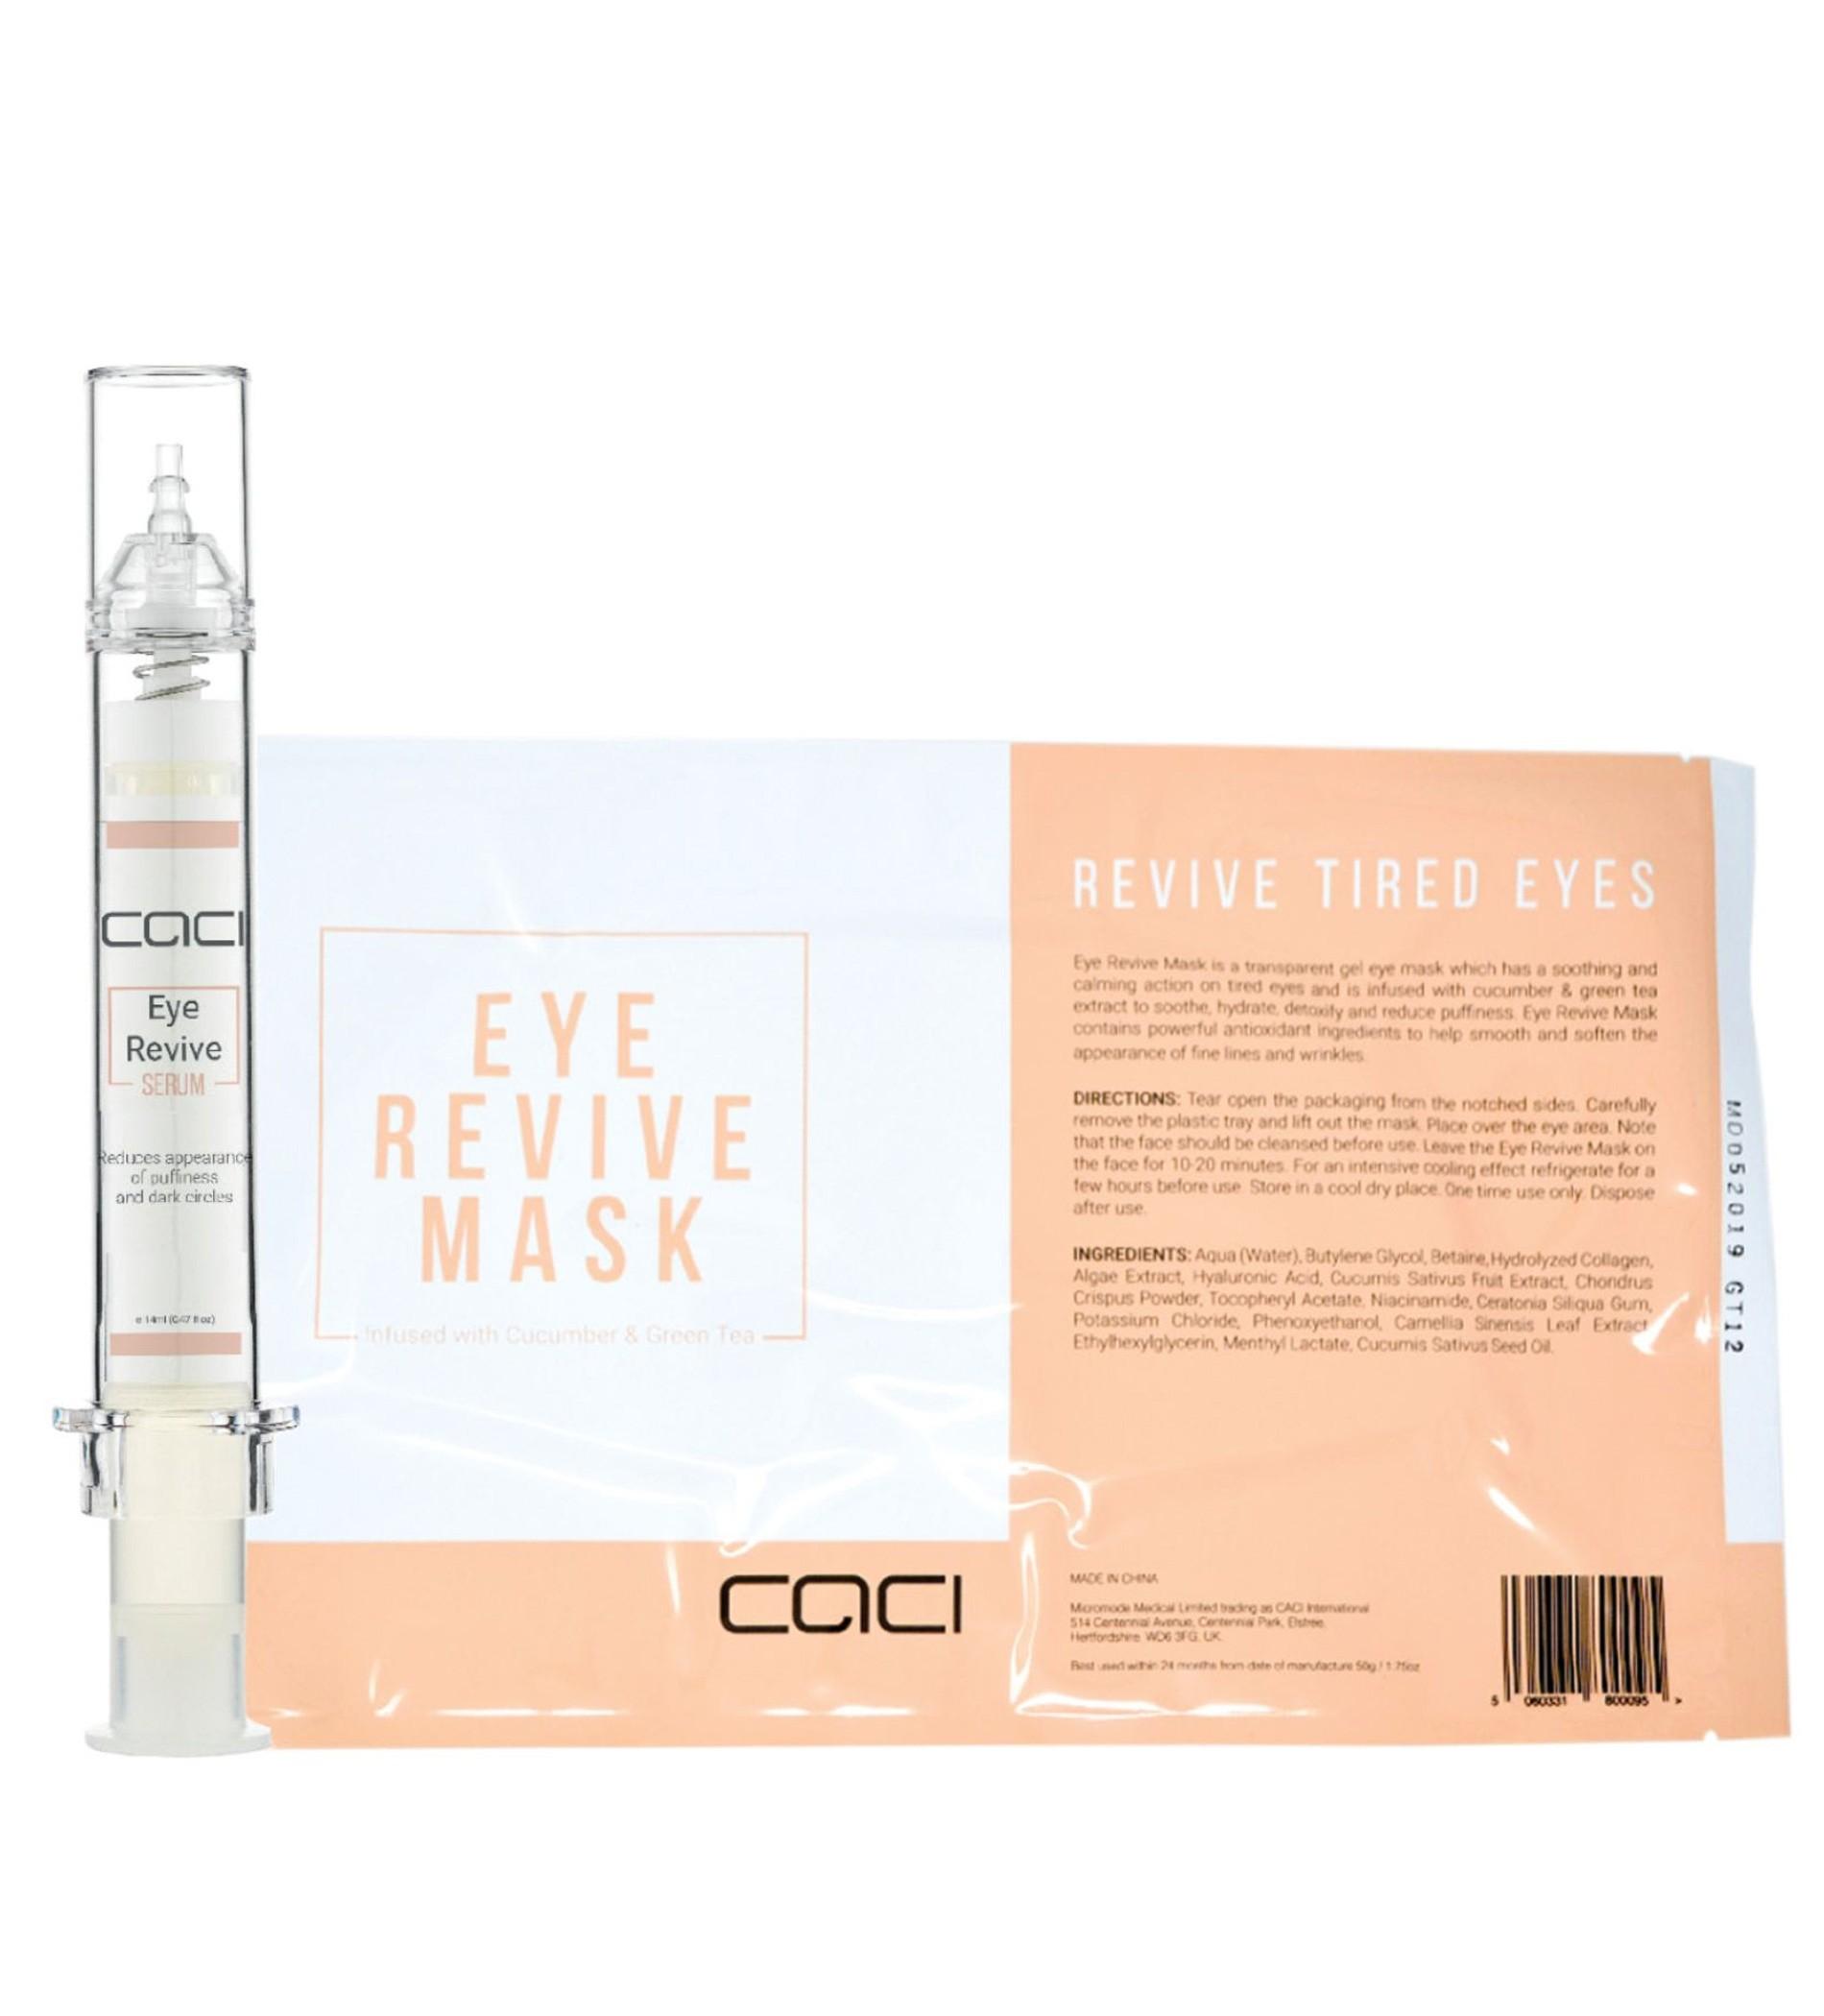 Caci Eye Revive Set - Eye Revive Serum & Mask